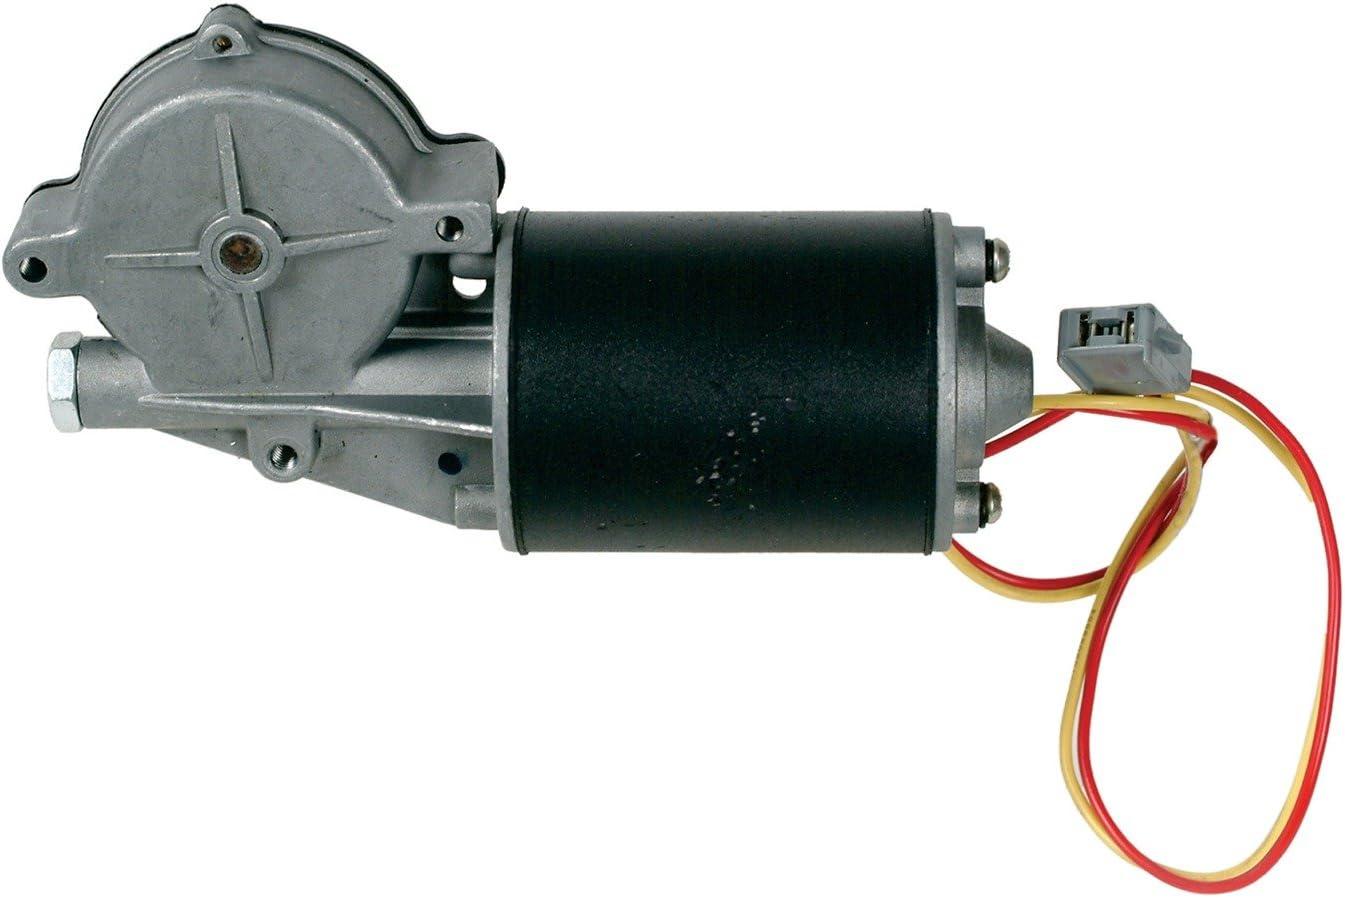 Cardone Select 82-31 New Window Lift Motor